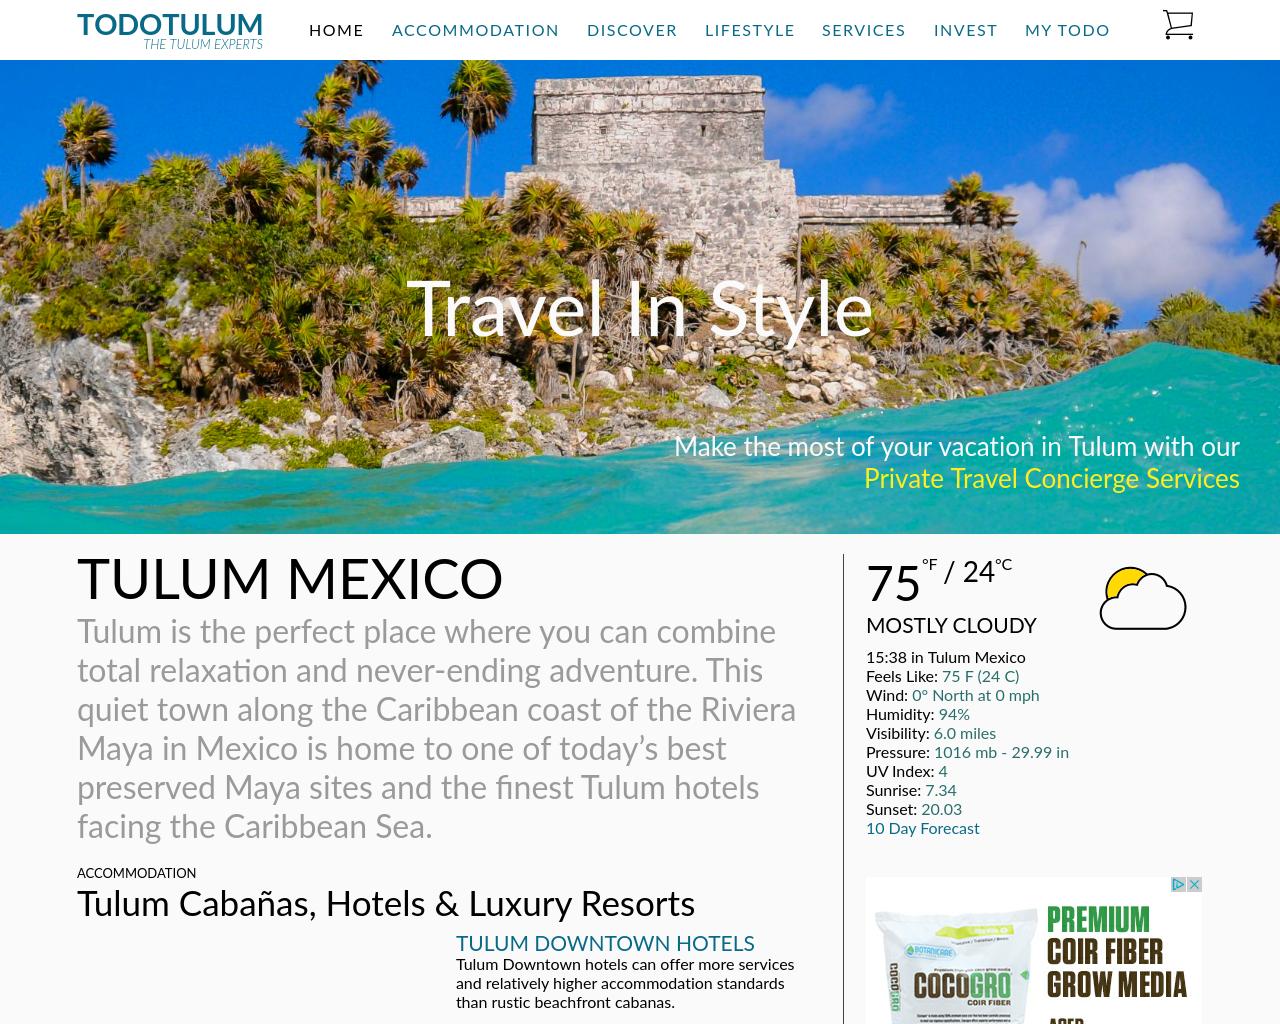 Tulum-Mexico-Advertising-Reviews-Pricing